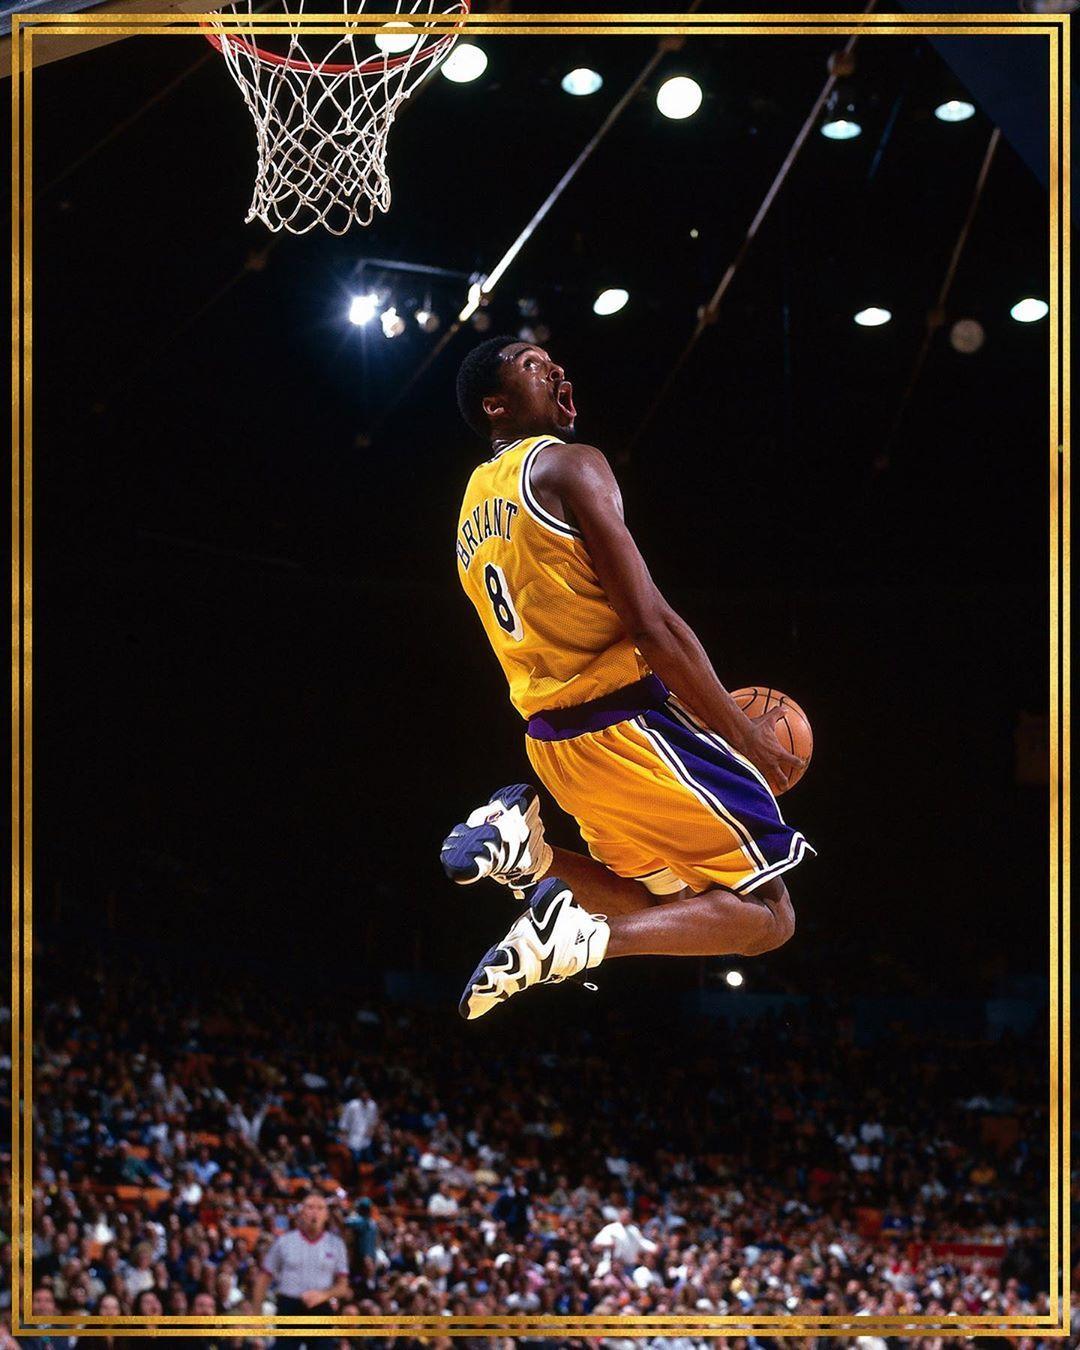 Wholenewgame On Instagram 8 24 Kobe Bryant Iphone Wallpaper Kobe Bryant Wallpaper Kobe Bryant Poster